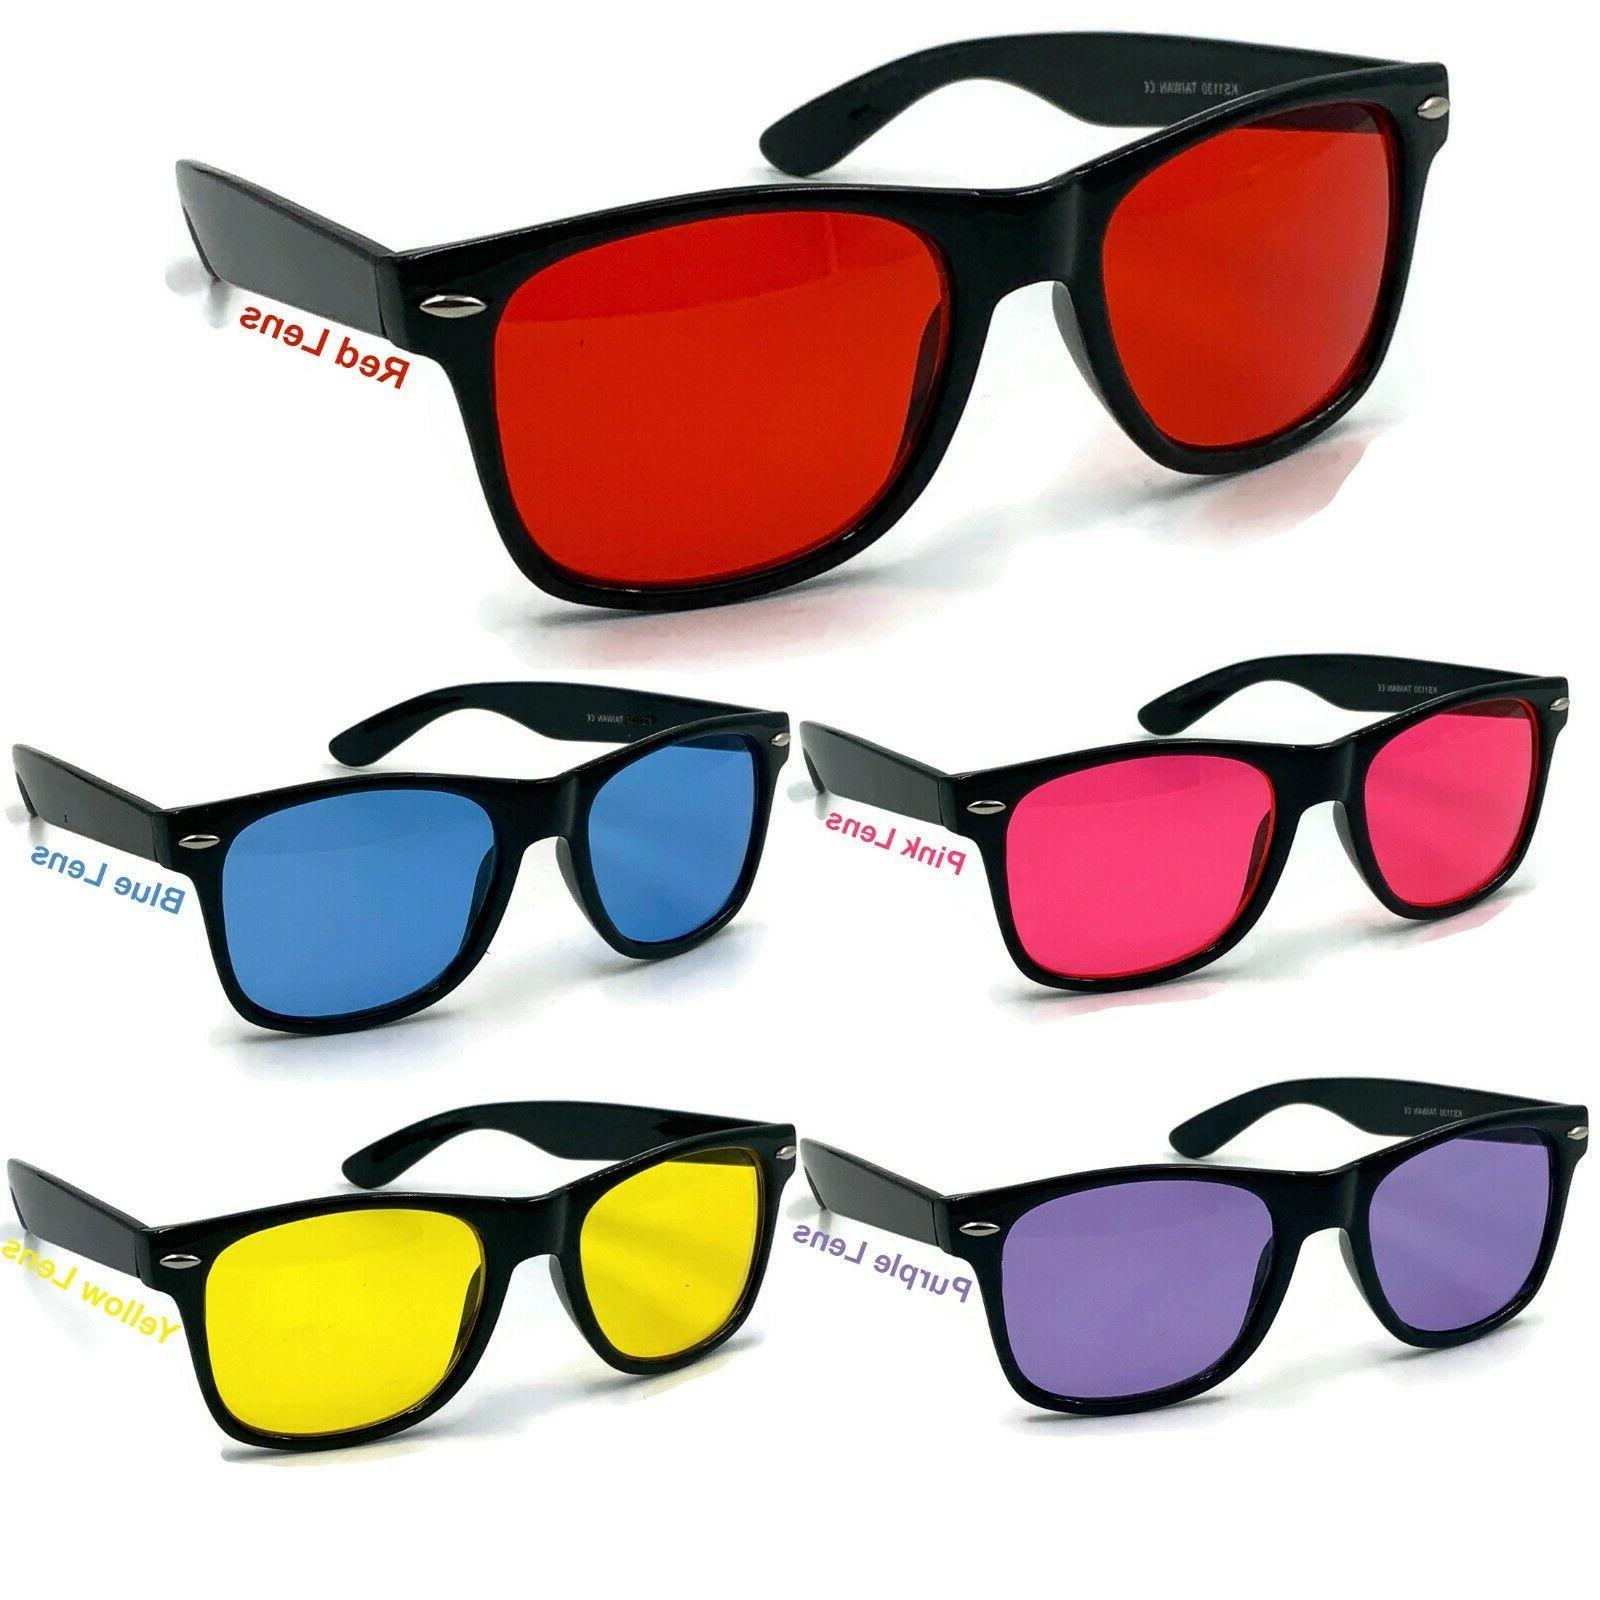 color tint lens glasses sunglasses classic men